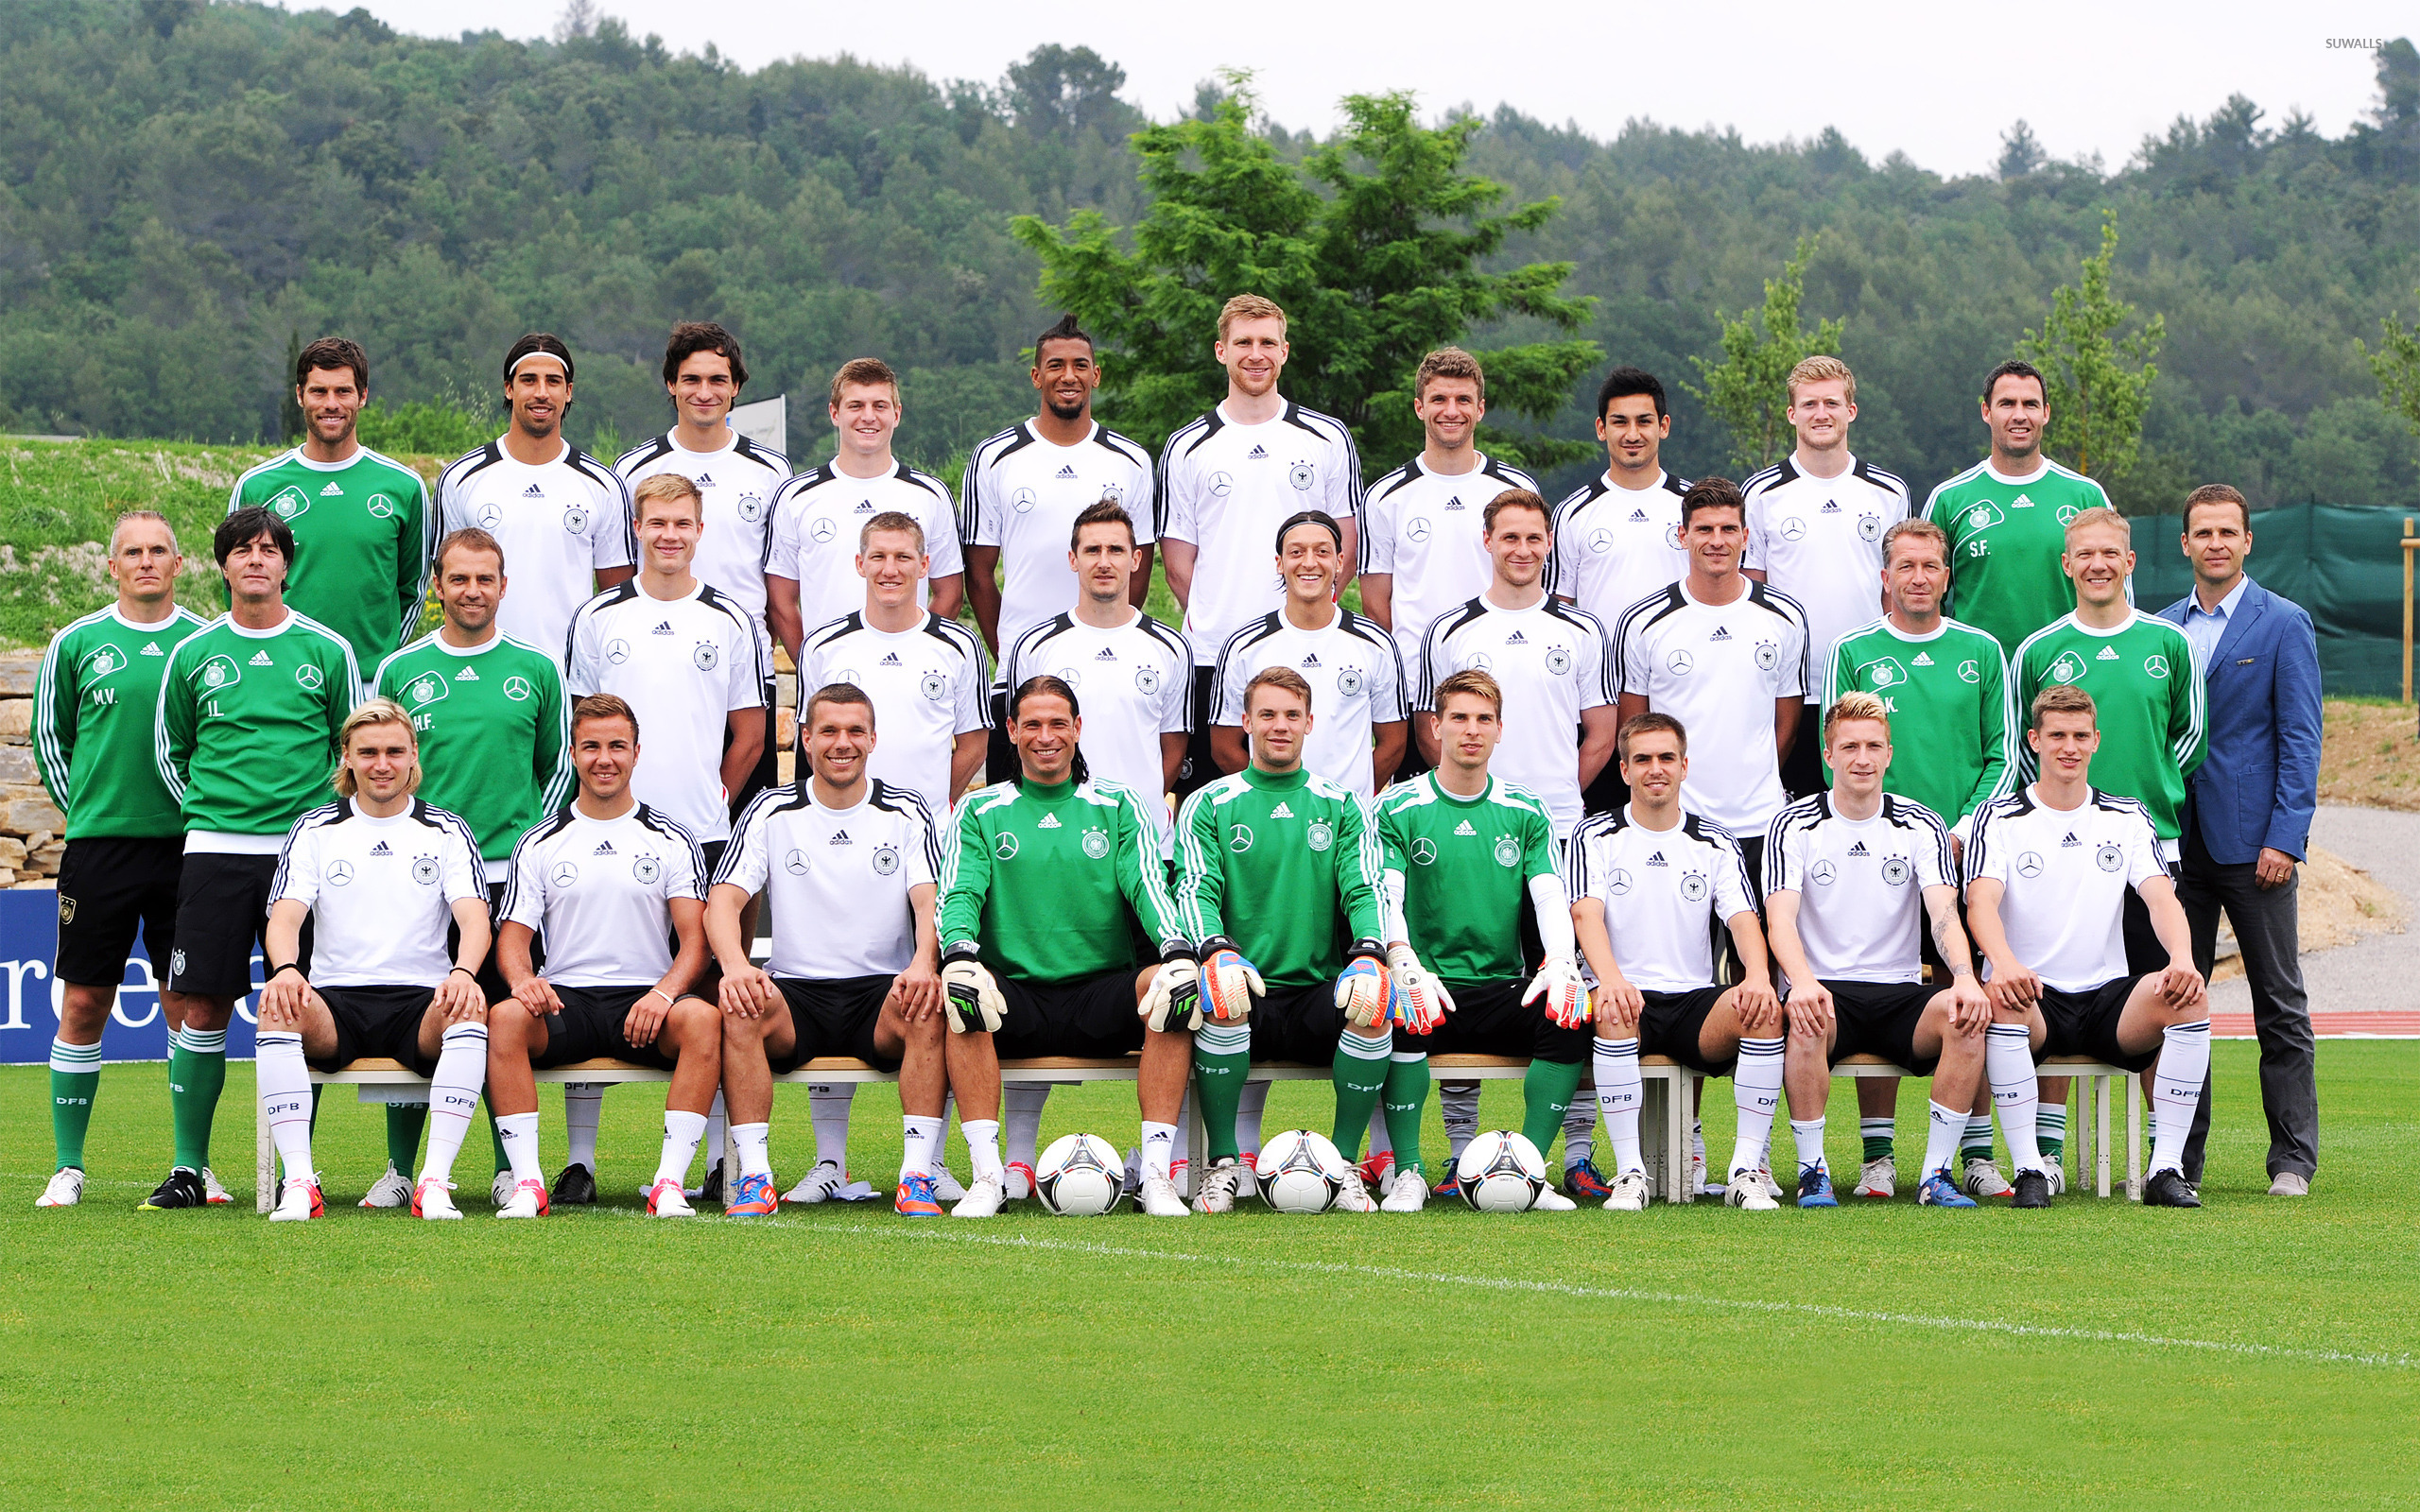 Germany national football team 2012 wallpaper 2560x1600 2560x1600